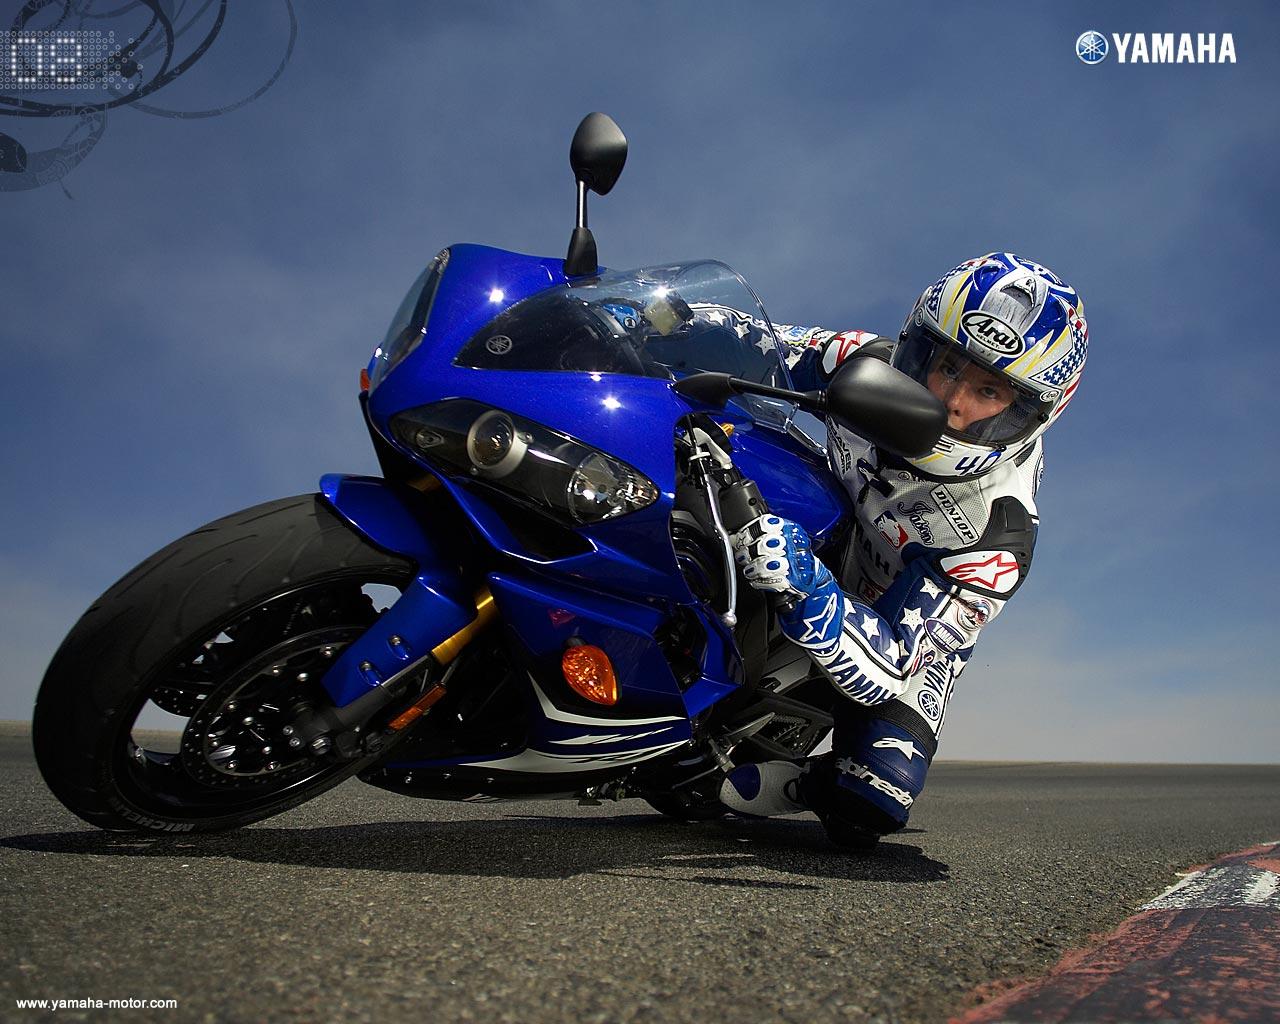 Yamaha YZF R1 Anniversary Edition 4K Wallpapers   HD